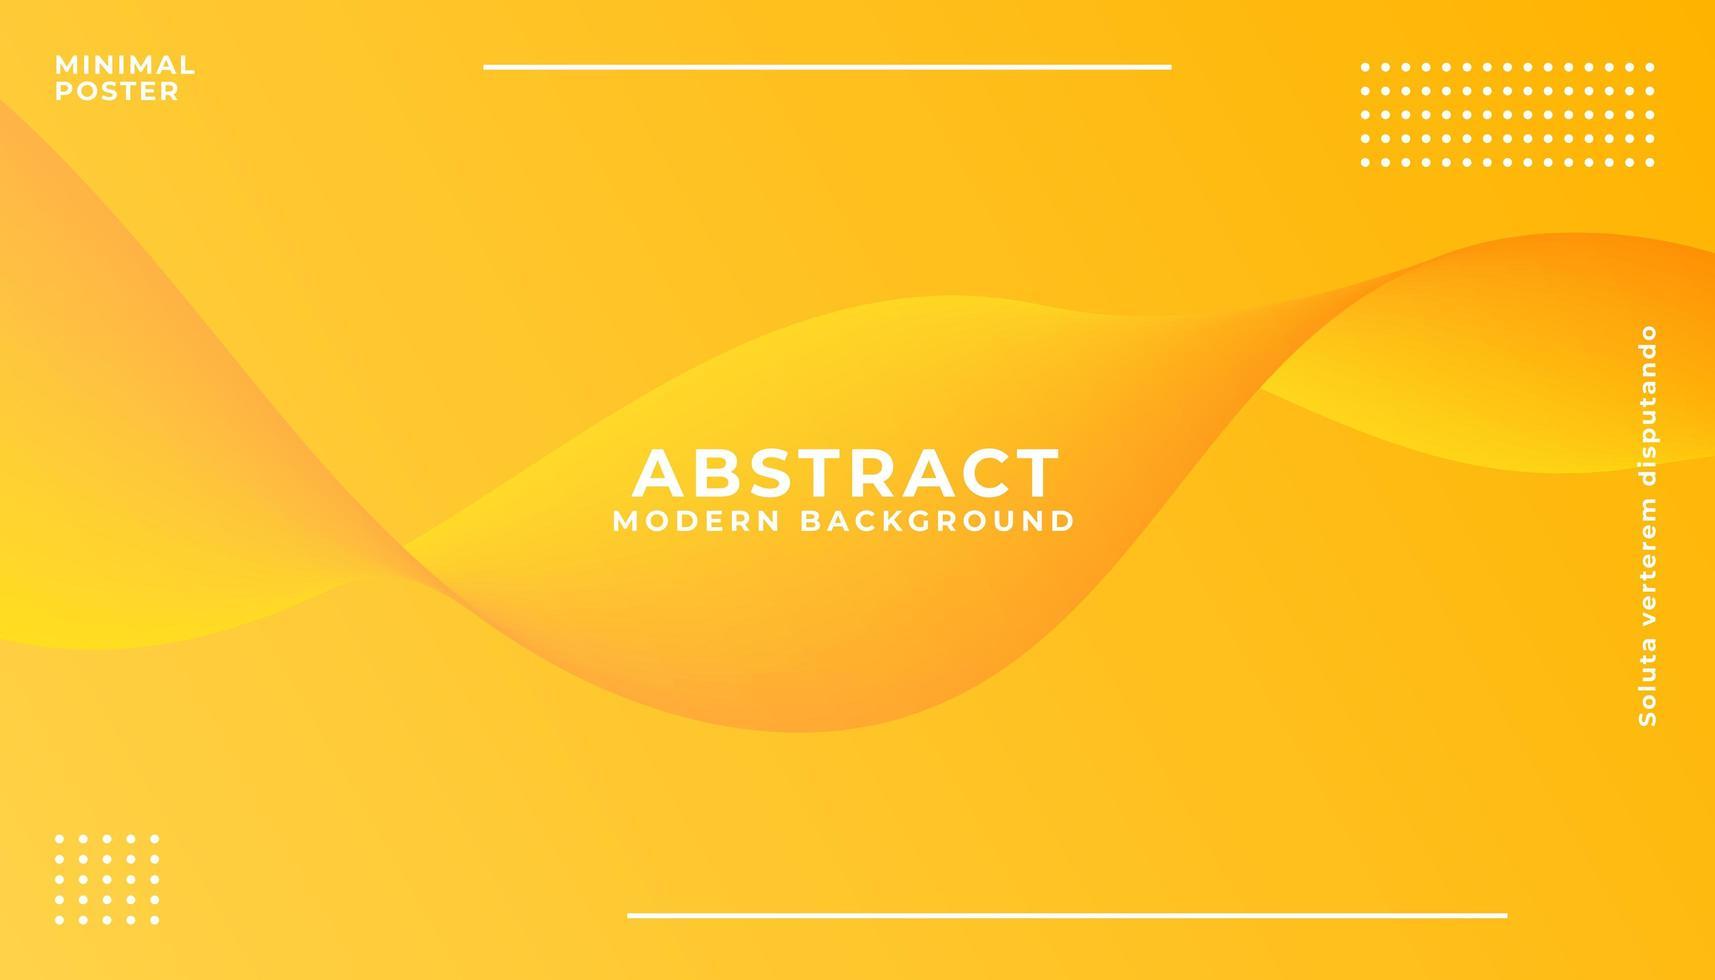 fundo abstrato onda amarela e laranja vetor